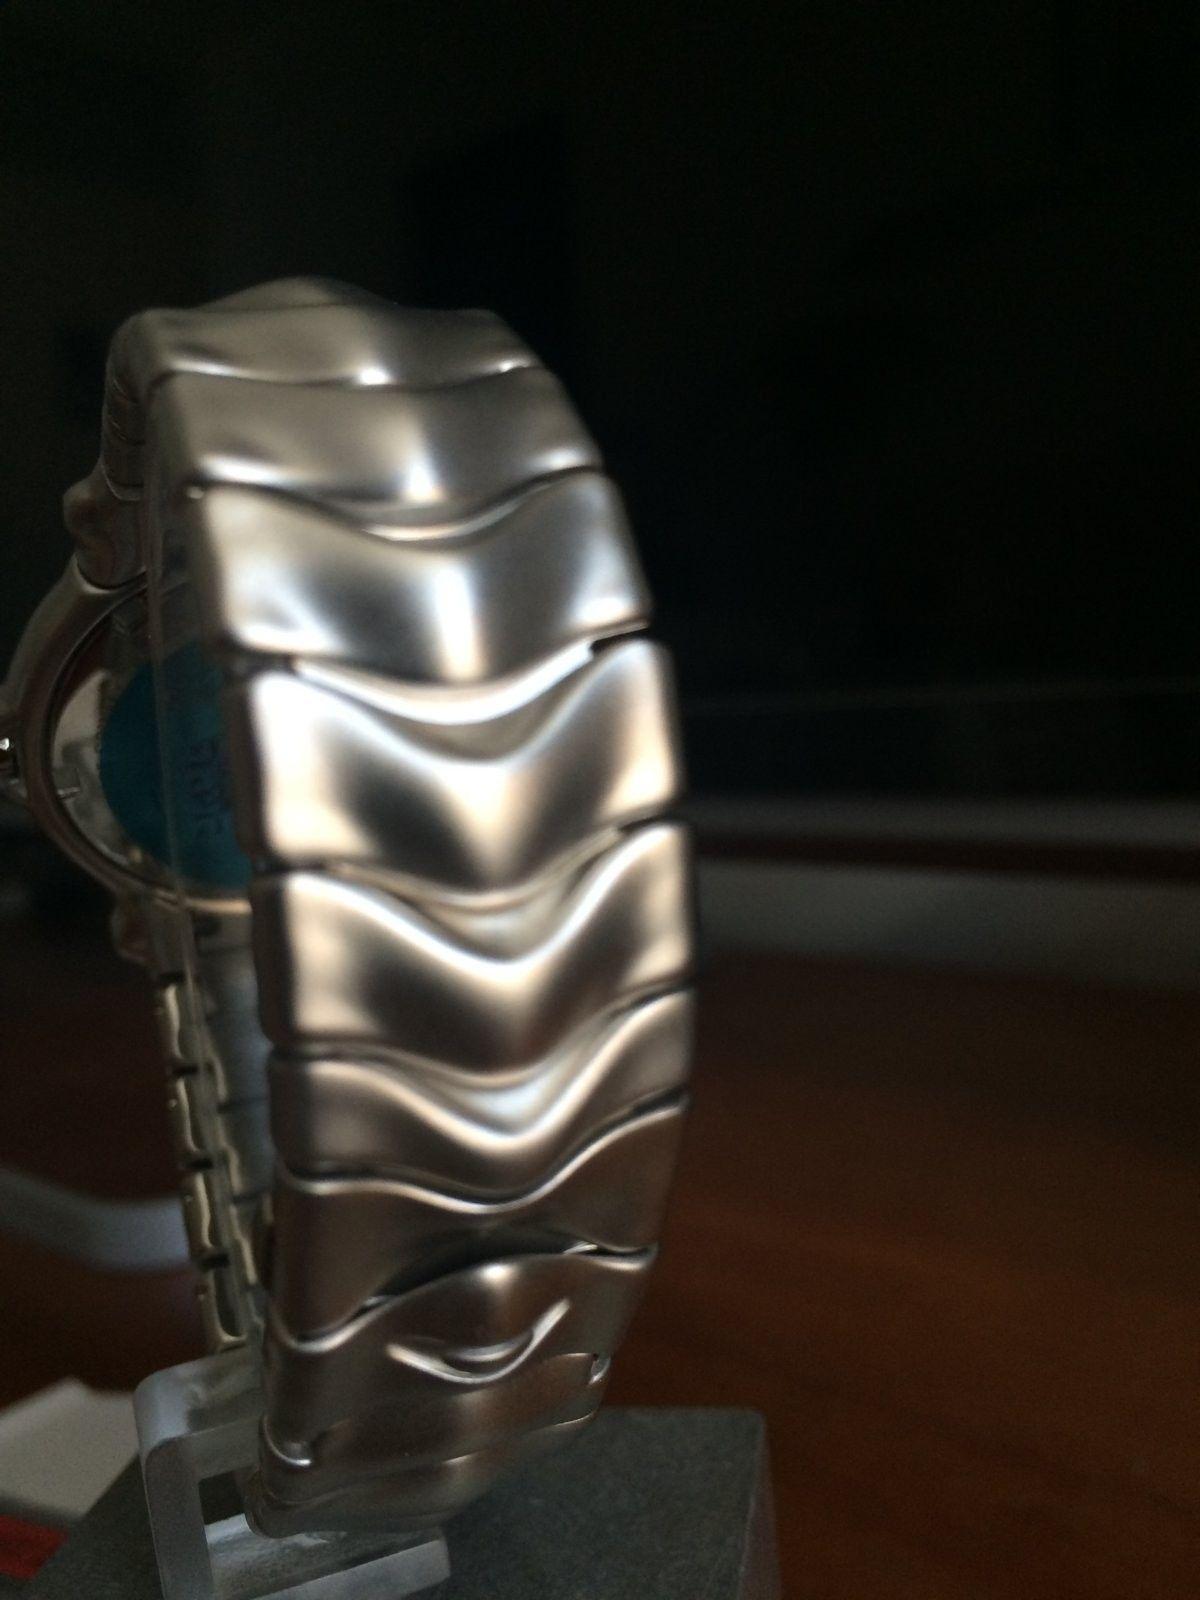 Oakley Jury Watch (BN) - Honed / Gunmetal (SKU 10-170) - IMG_2901.JPG